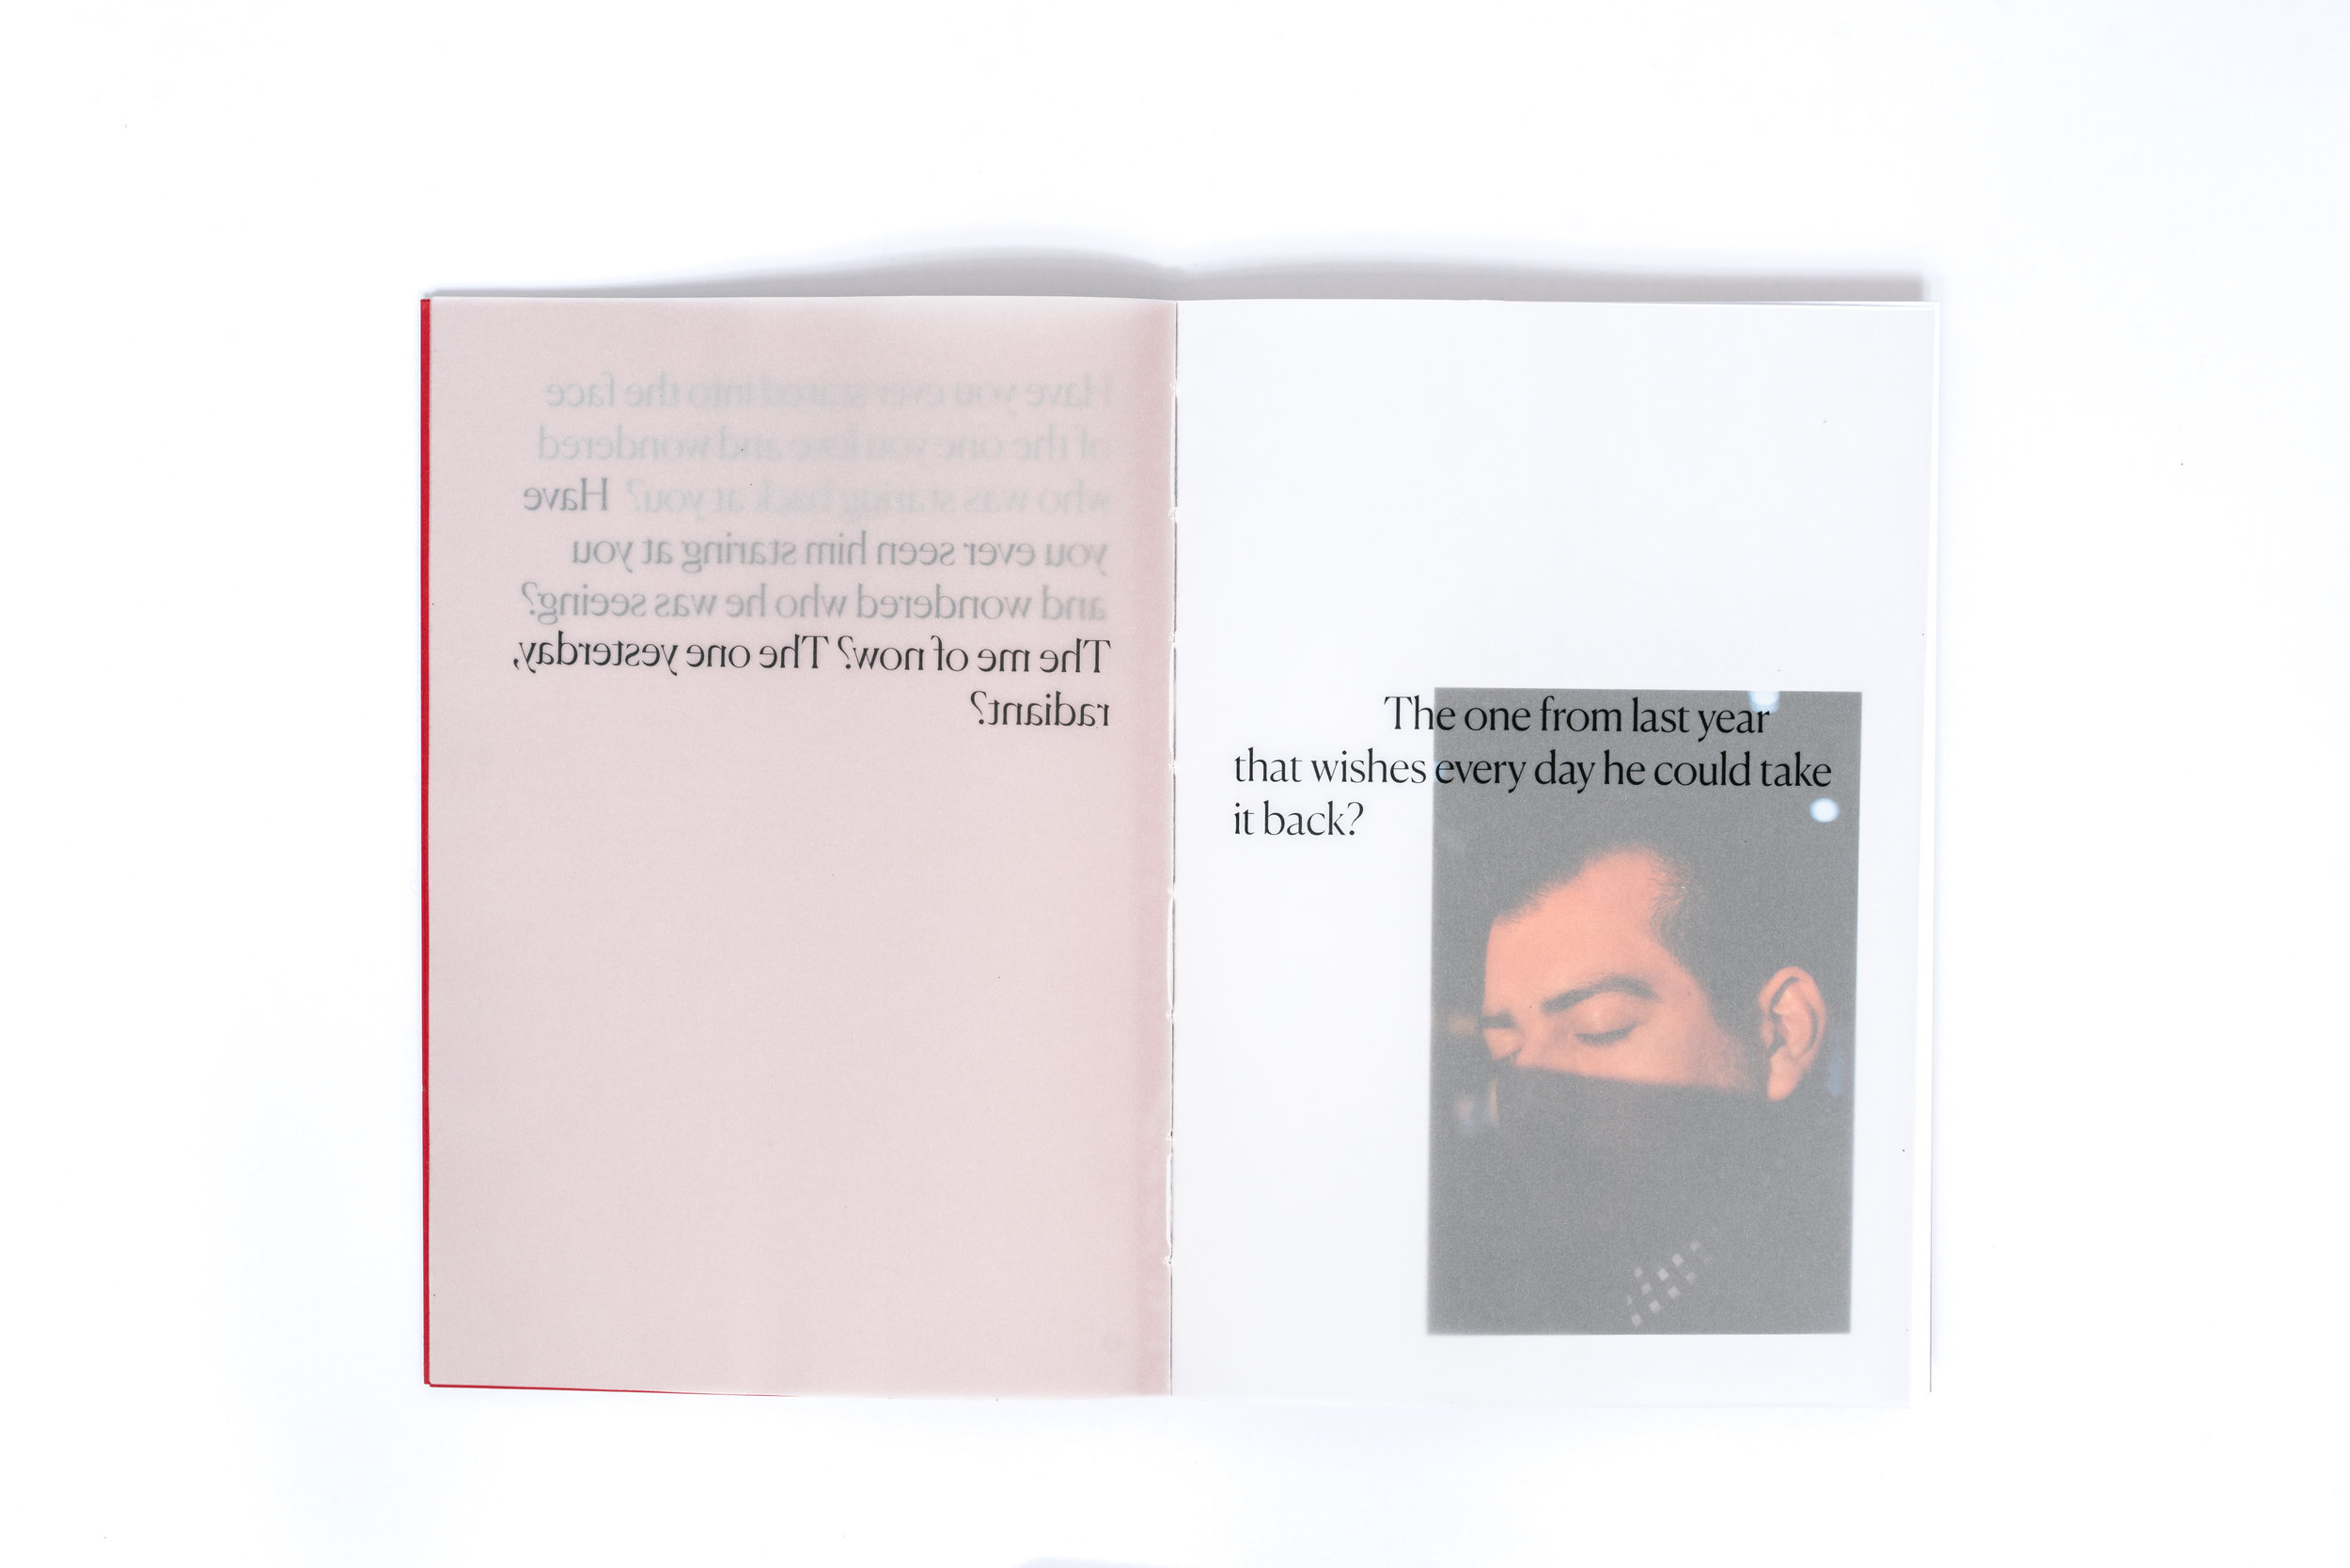 When-We-Were-Strangers_Jake-Naughton_Juan-Sosa_Book-Views-06142.jpg